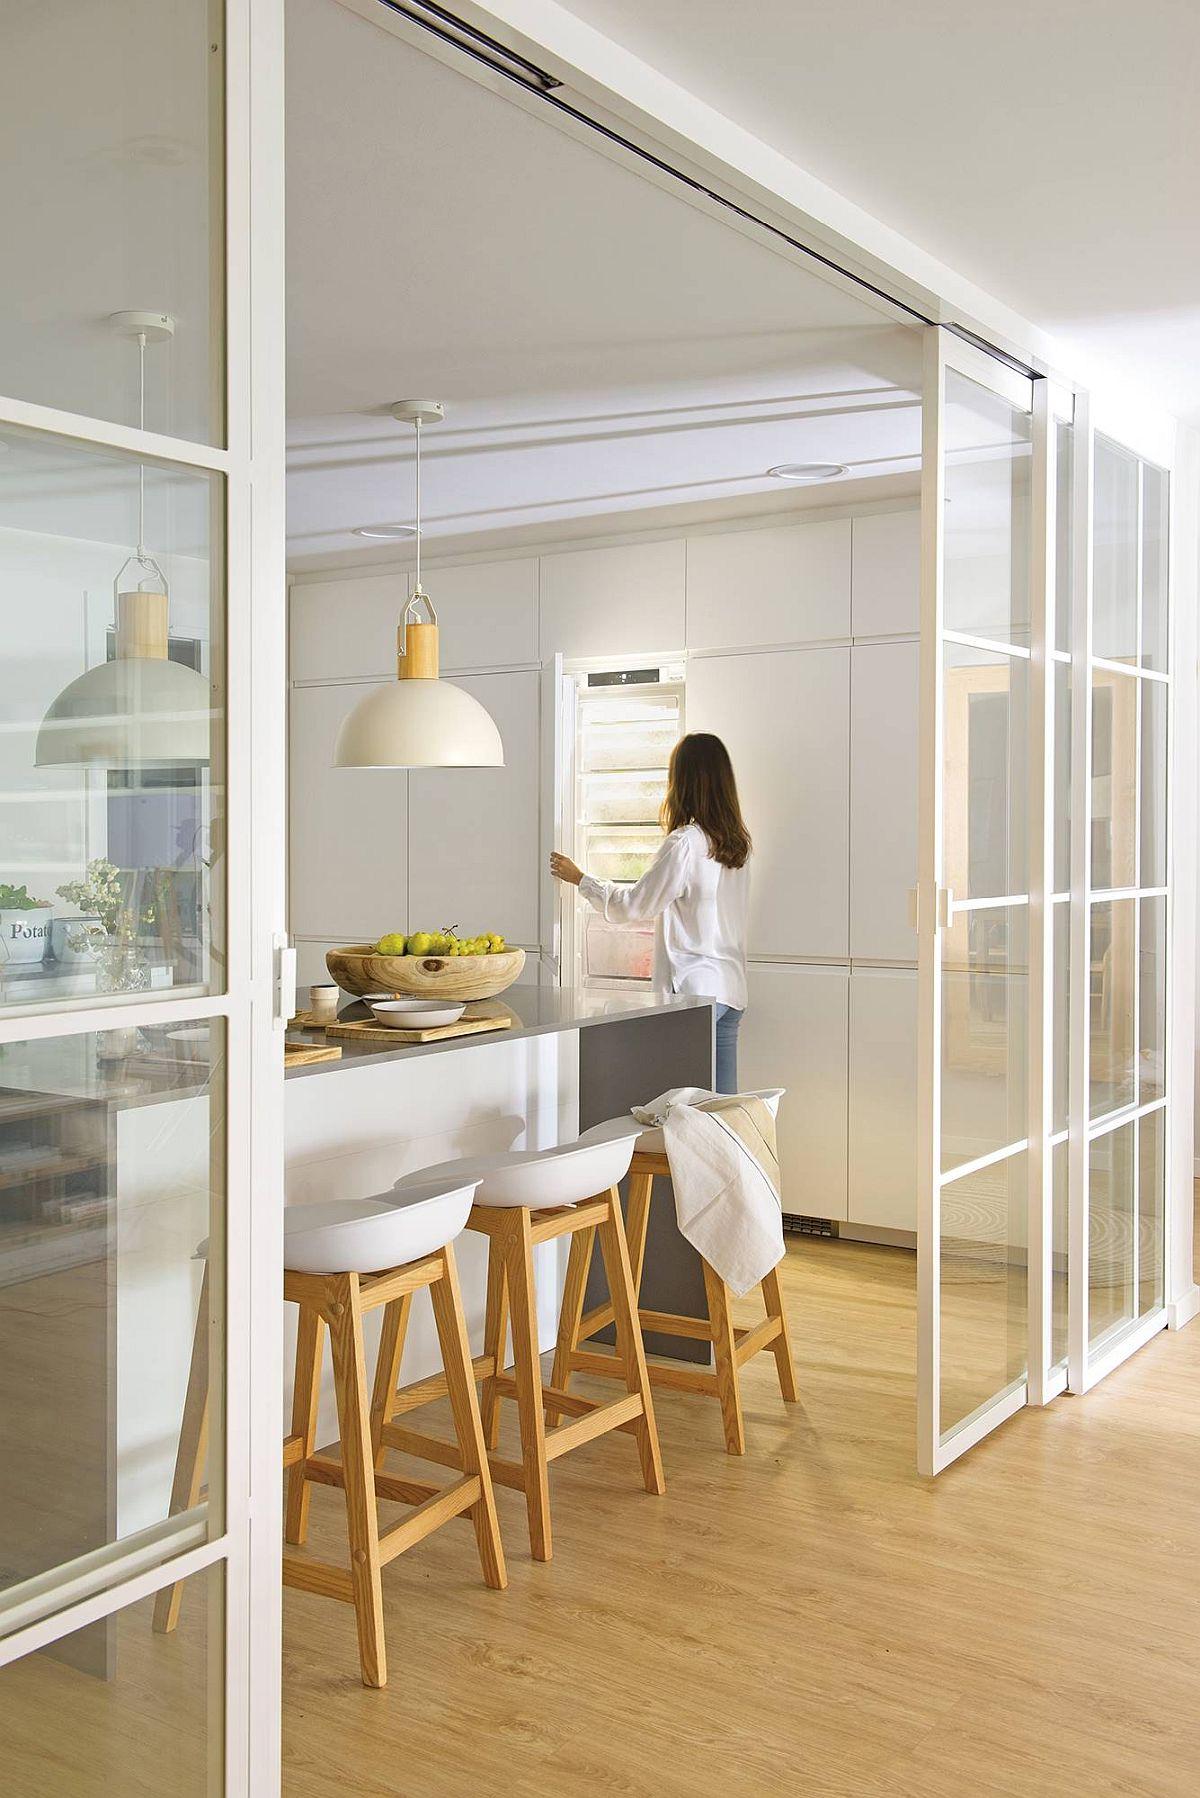 adelaparvu.com despre amenajare apartament luminos, 85 mp, design interior I Loft You Studio, Barcelona, Foto ElMueble, Stella Rotger (10)